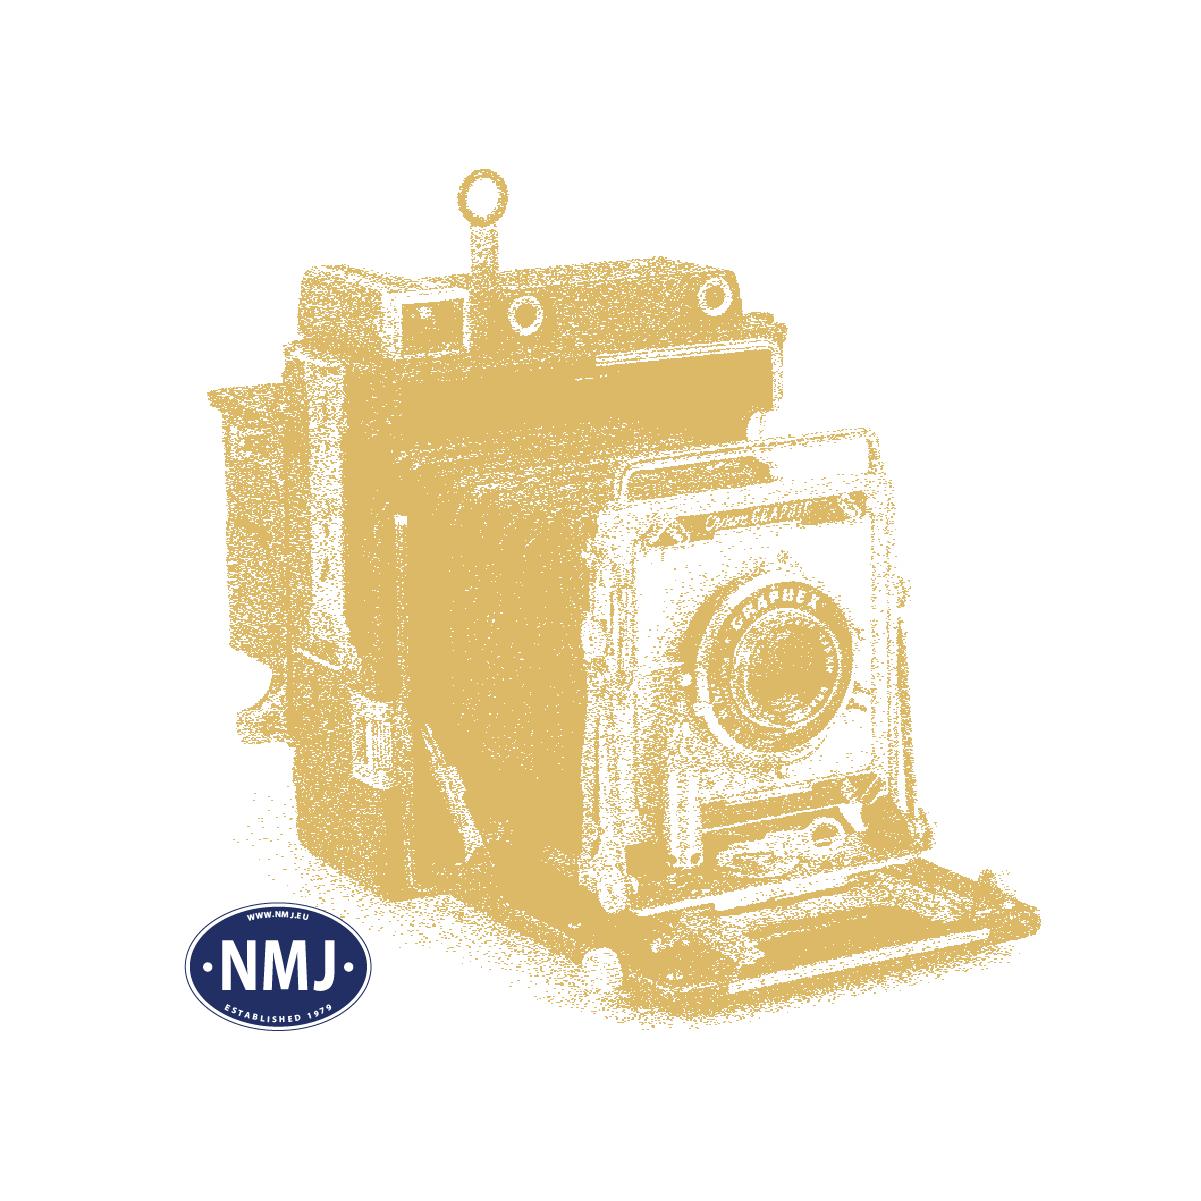 NOC15830 - Ølservering